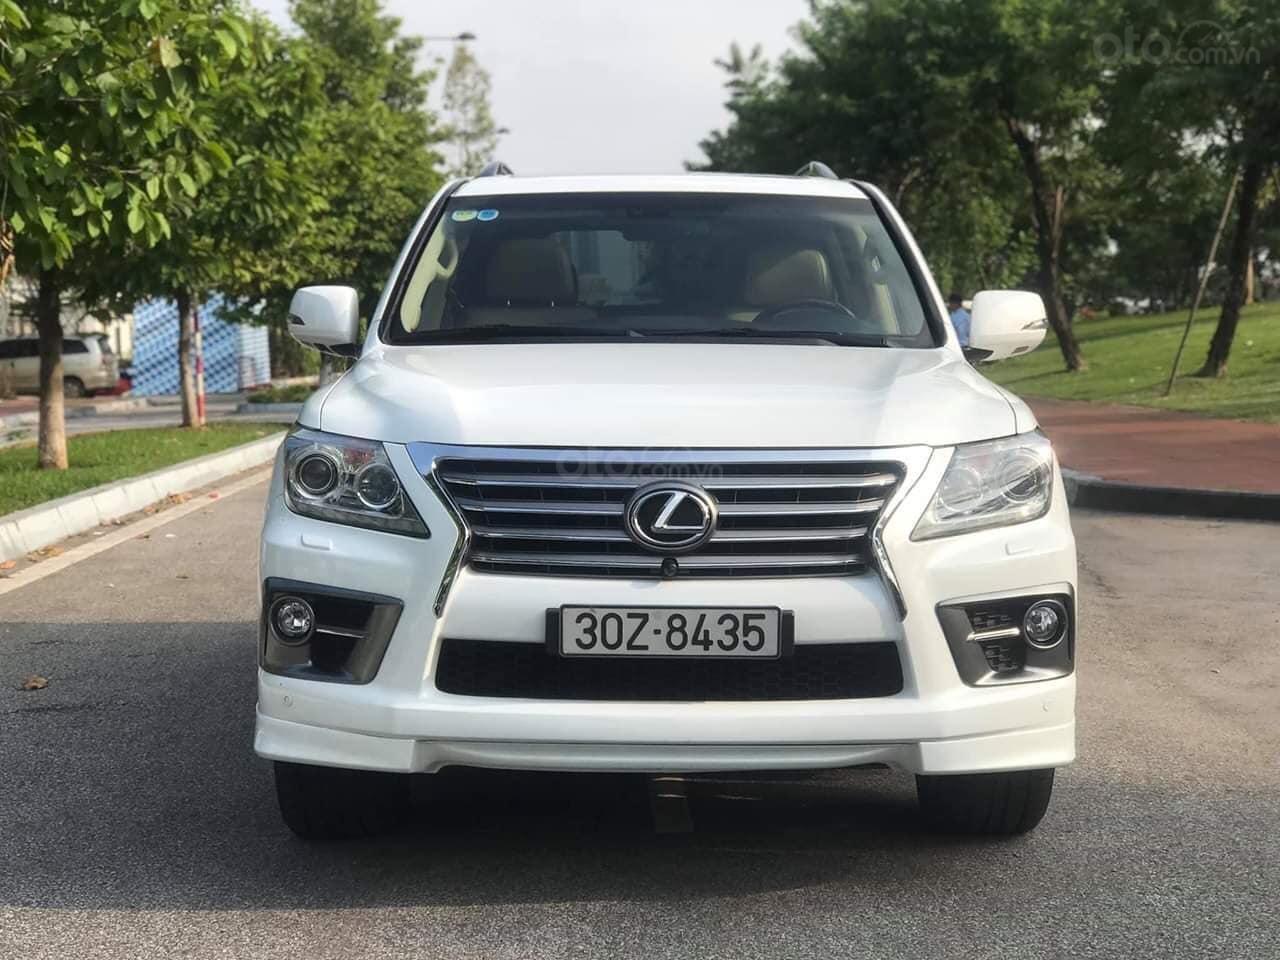 Giao ngay giao ngay Lexus LX570 trắng kem 2010 nhập Mỹ uy tín giá tốt (11)